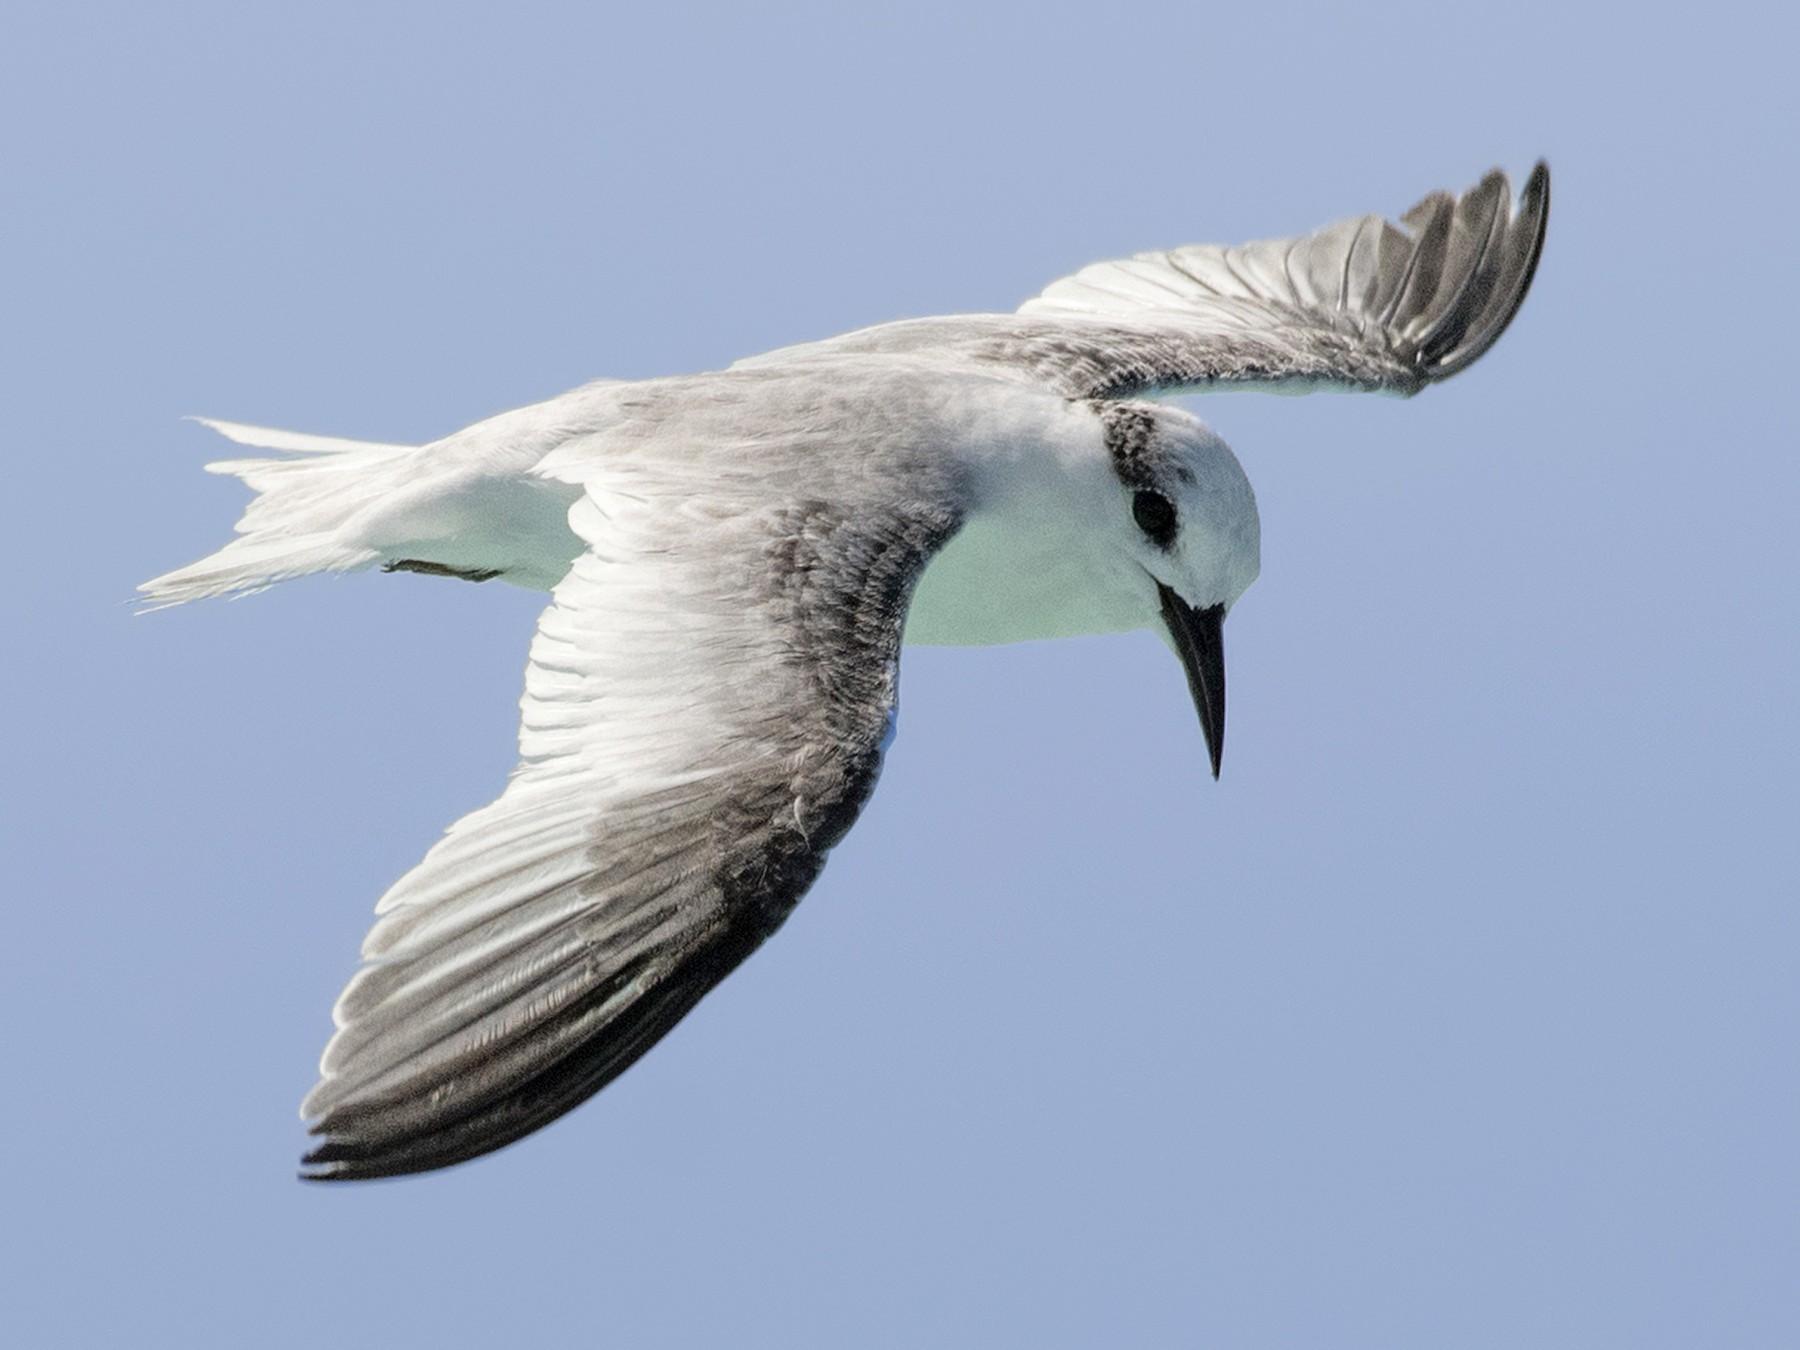 Least Tern - Carl Giometti